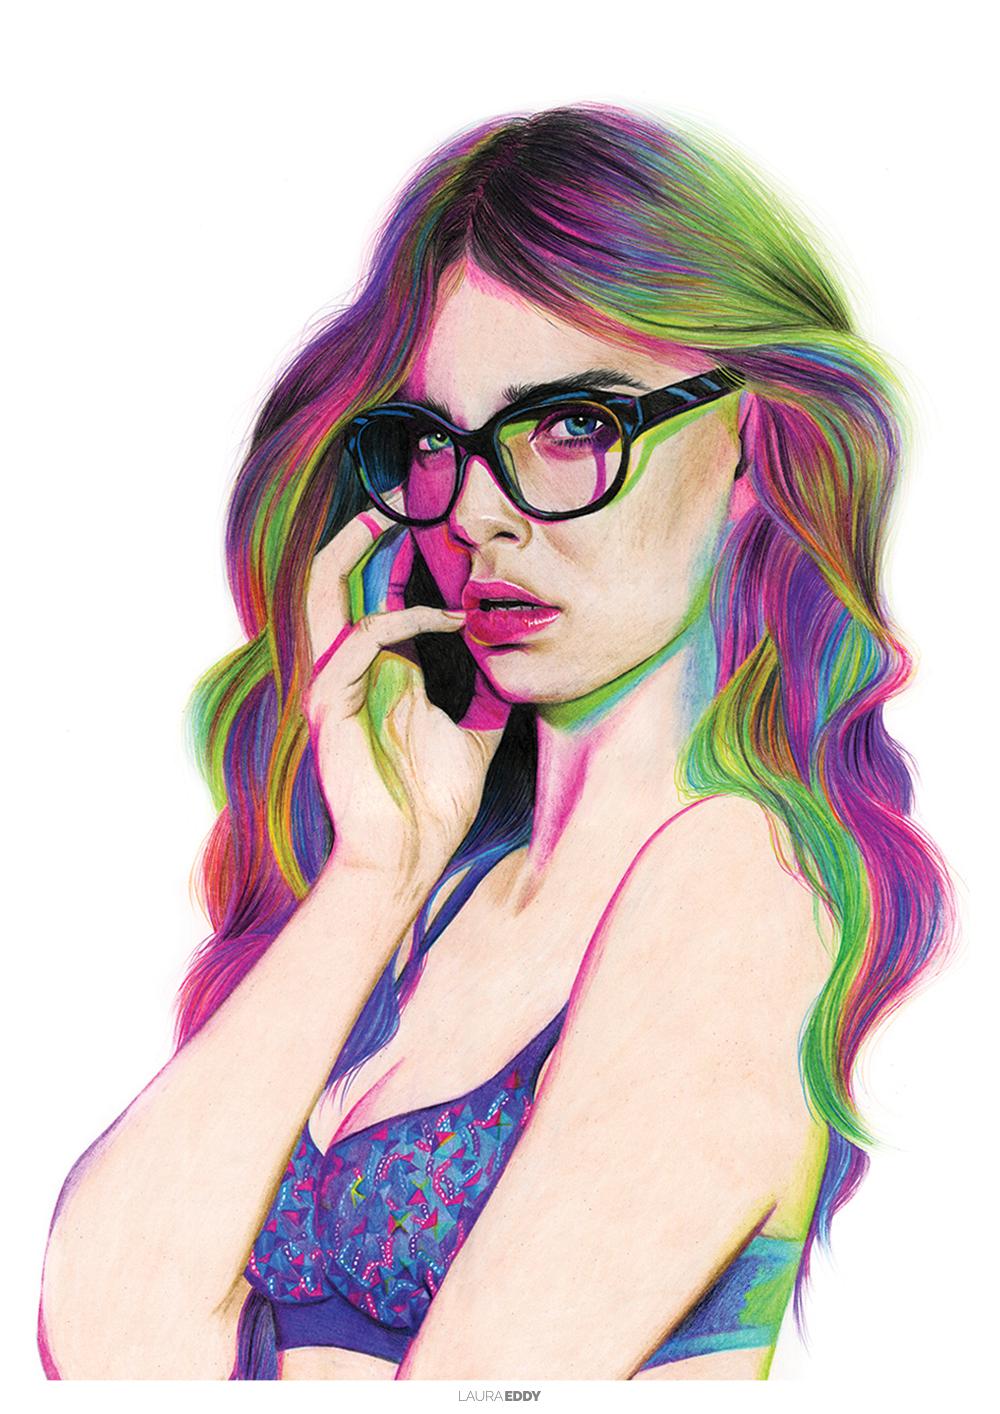 laura-eddy-drawing-cara-delevingne-neon-branded.jpg